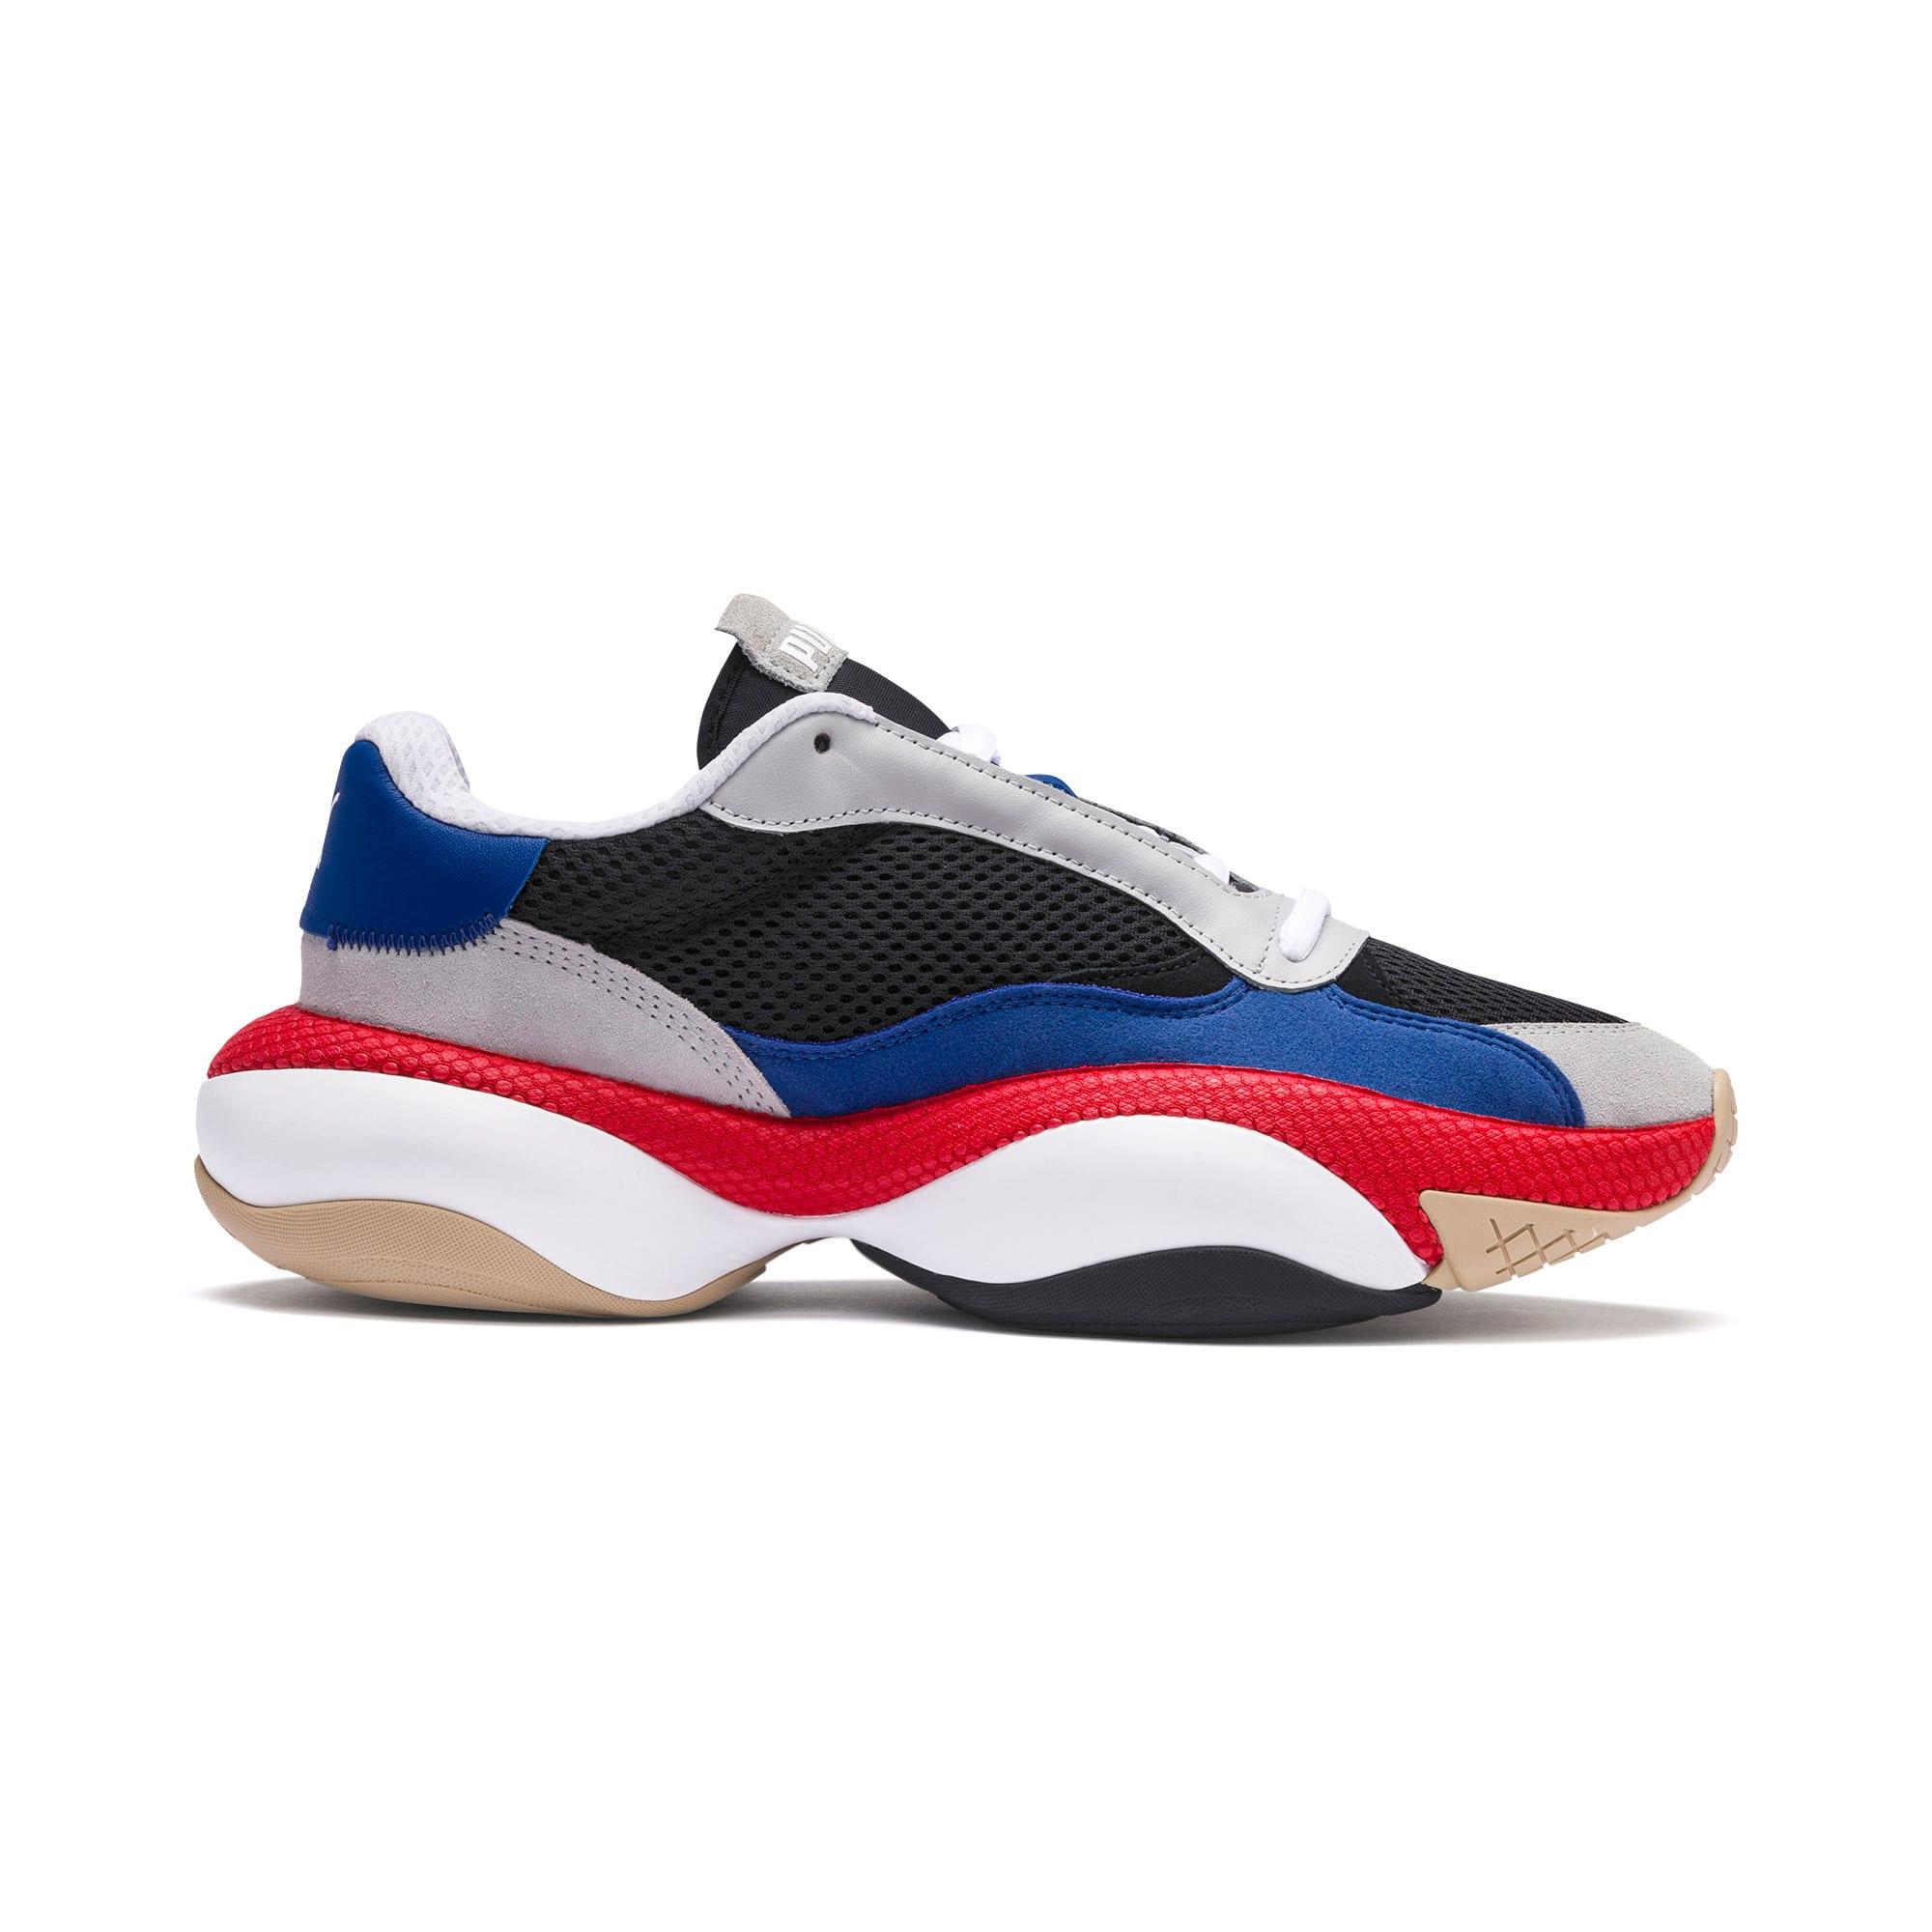 Thumbnail 5 of Alteration Kurve Sneakers, High Rise-Puma Black, medium